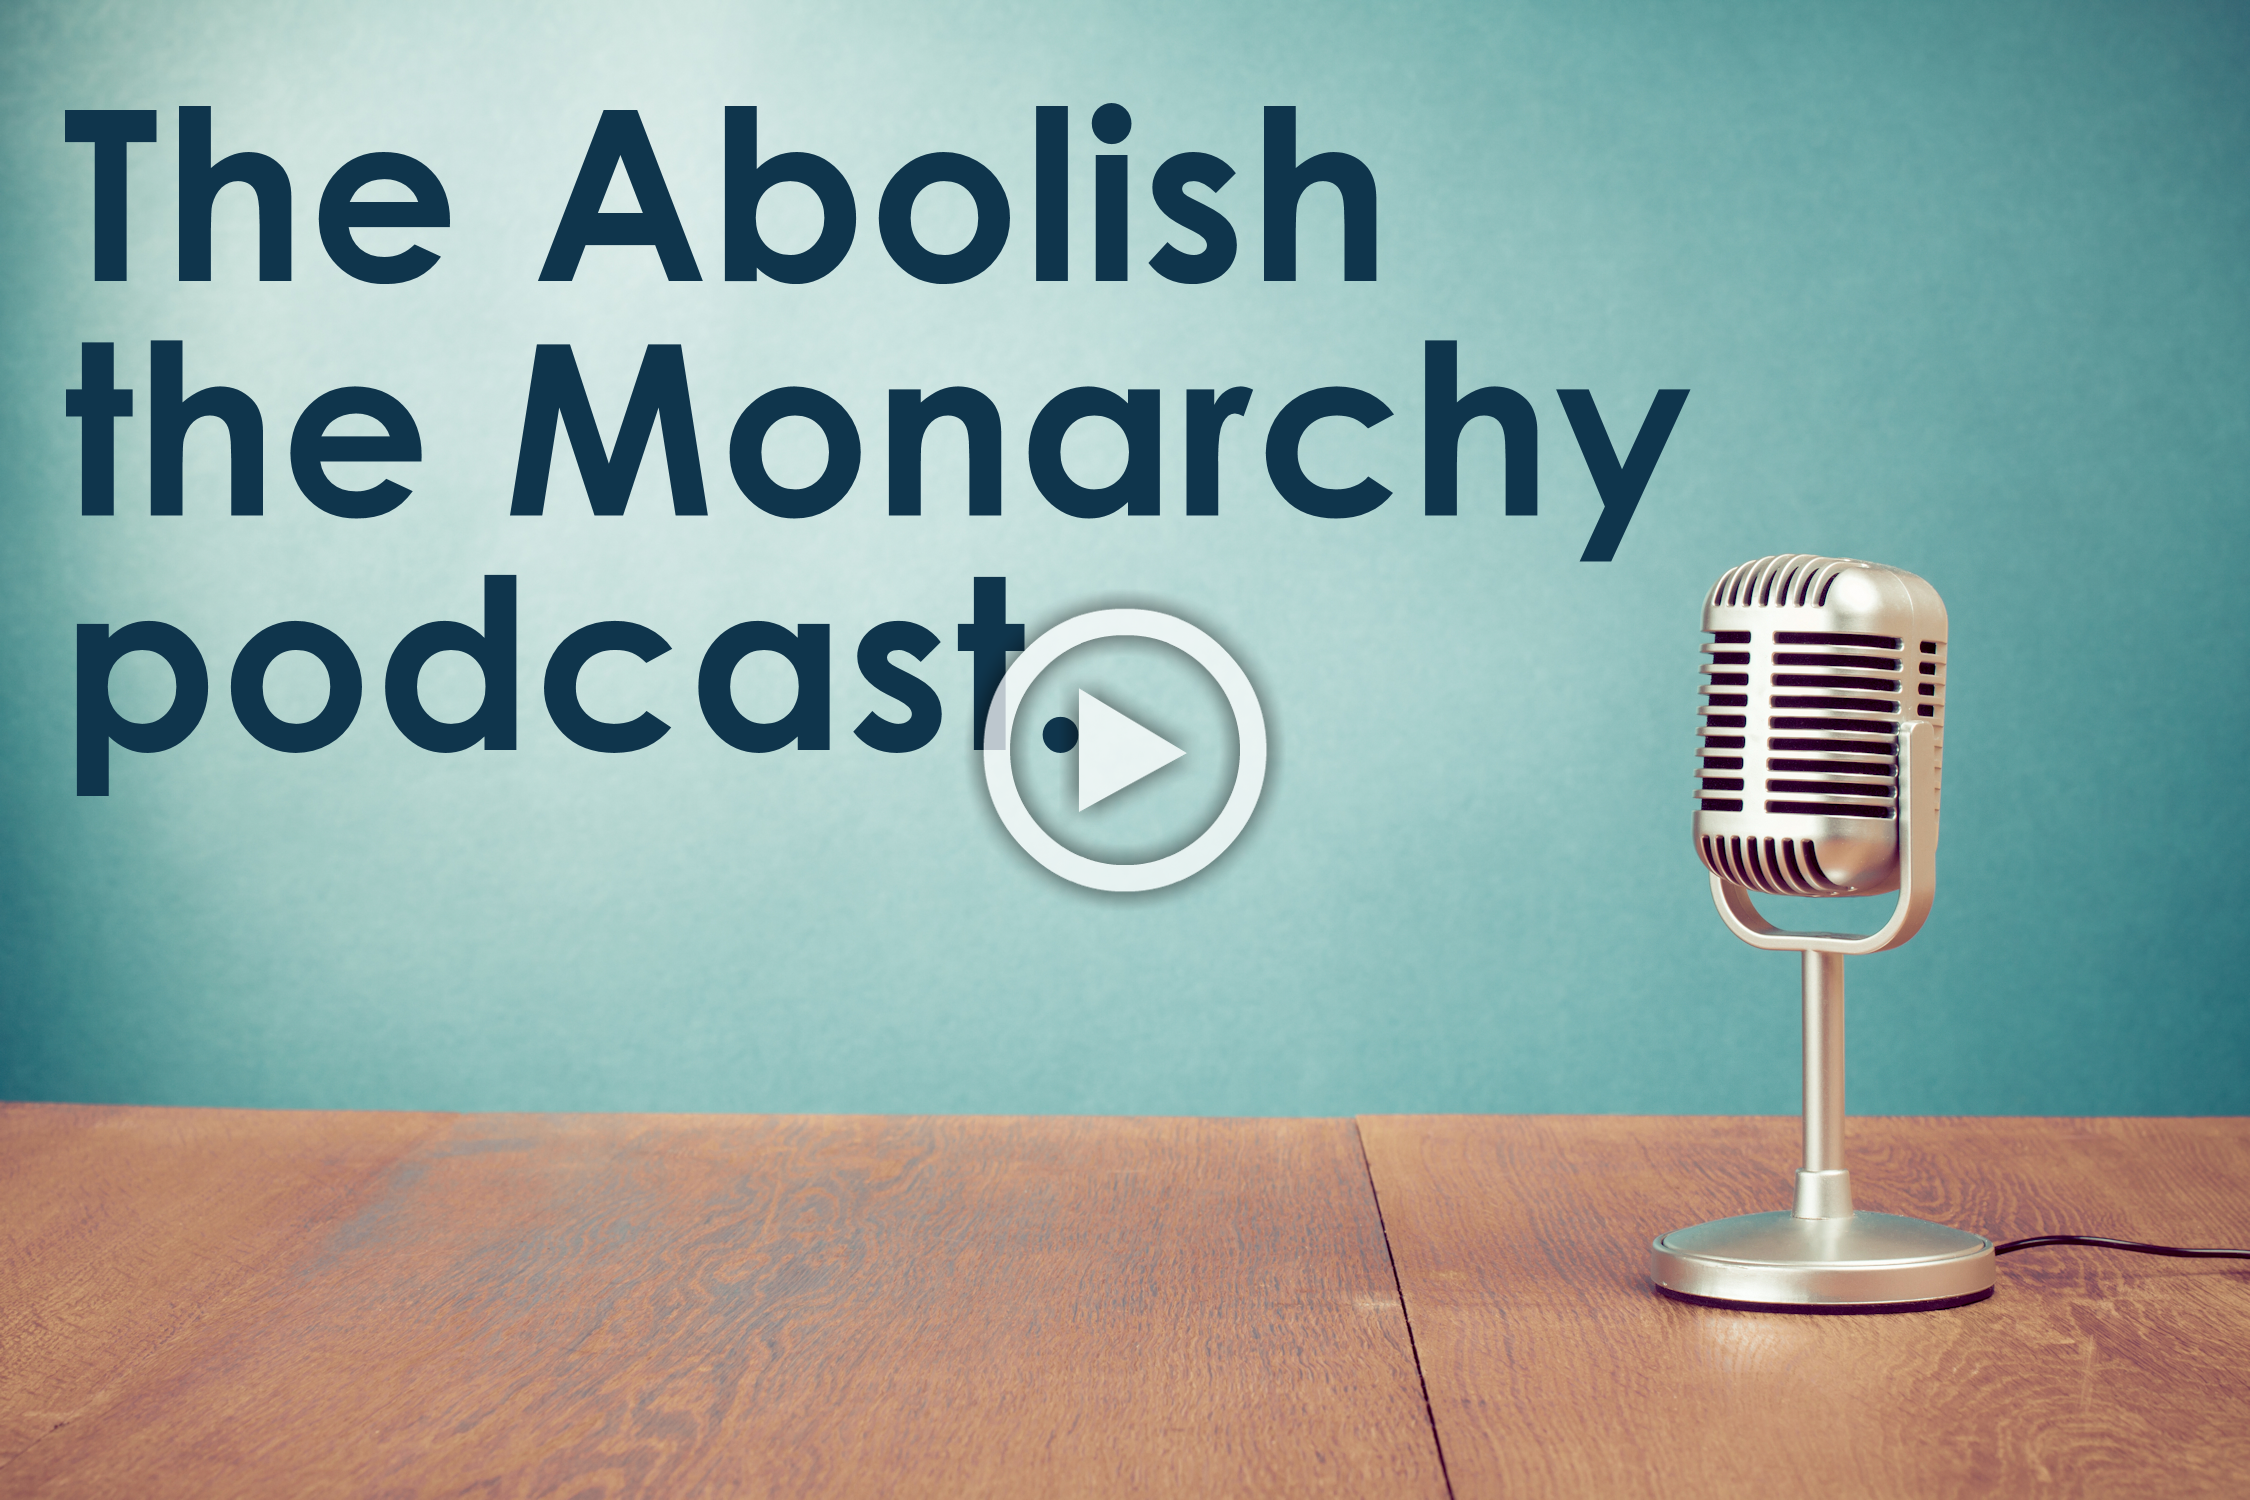 Abolish the monarchy podcast